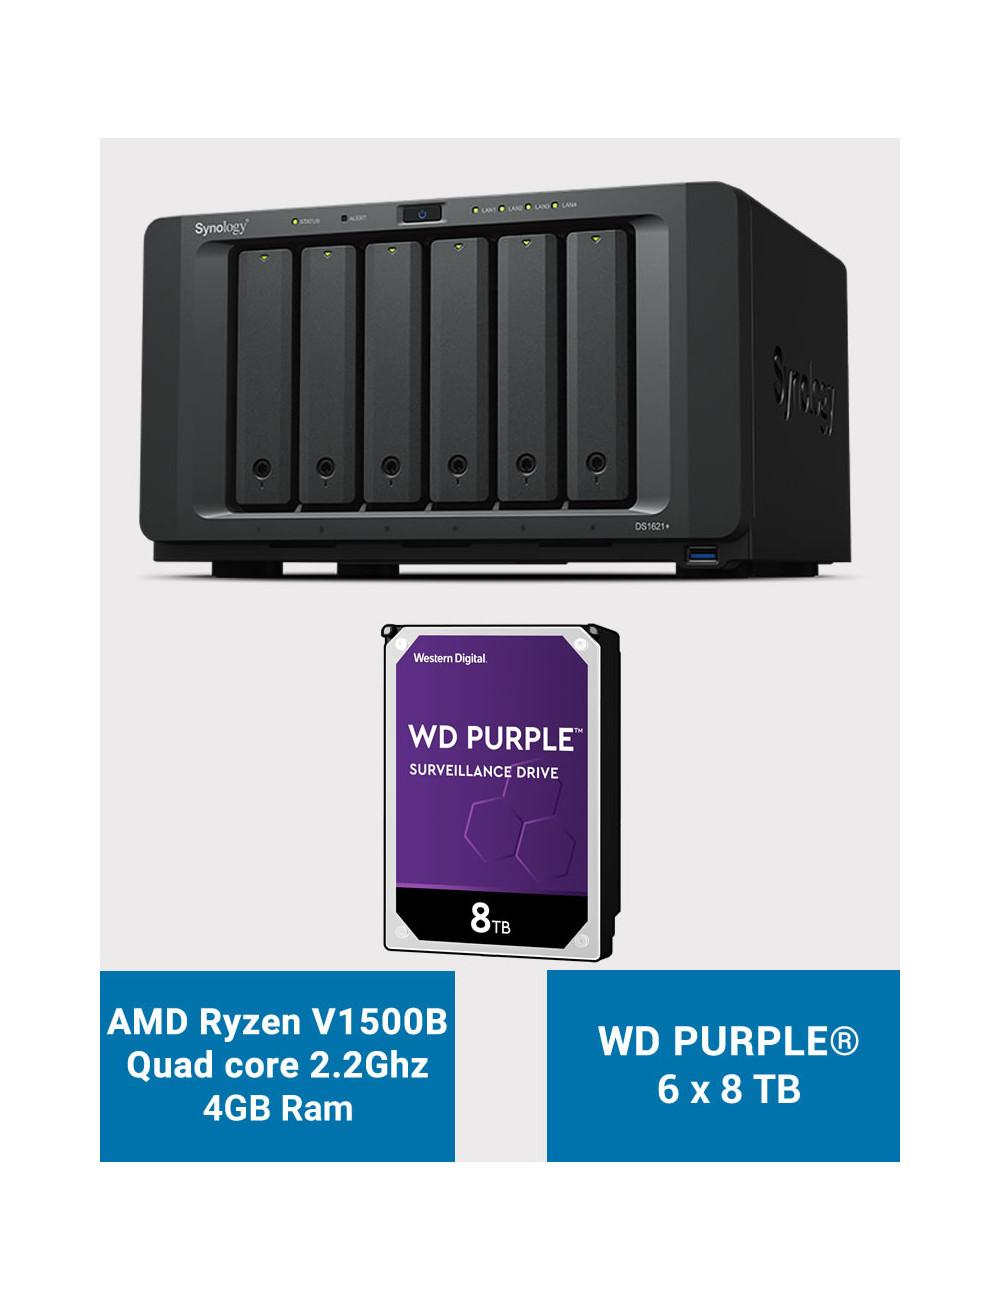 Firewall E-WALL Q5C65216 sous pfSense® CE 6 ports 2Go SSD 16Go